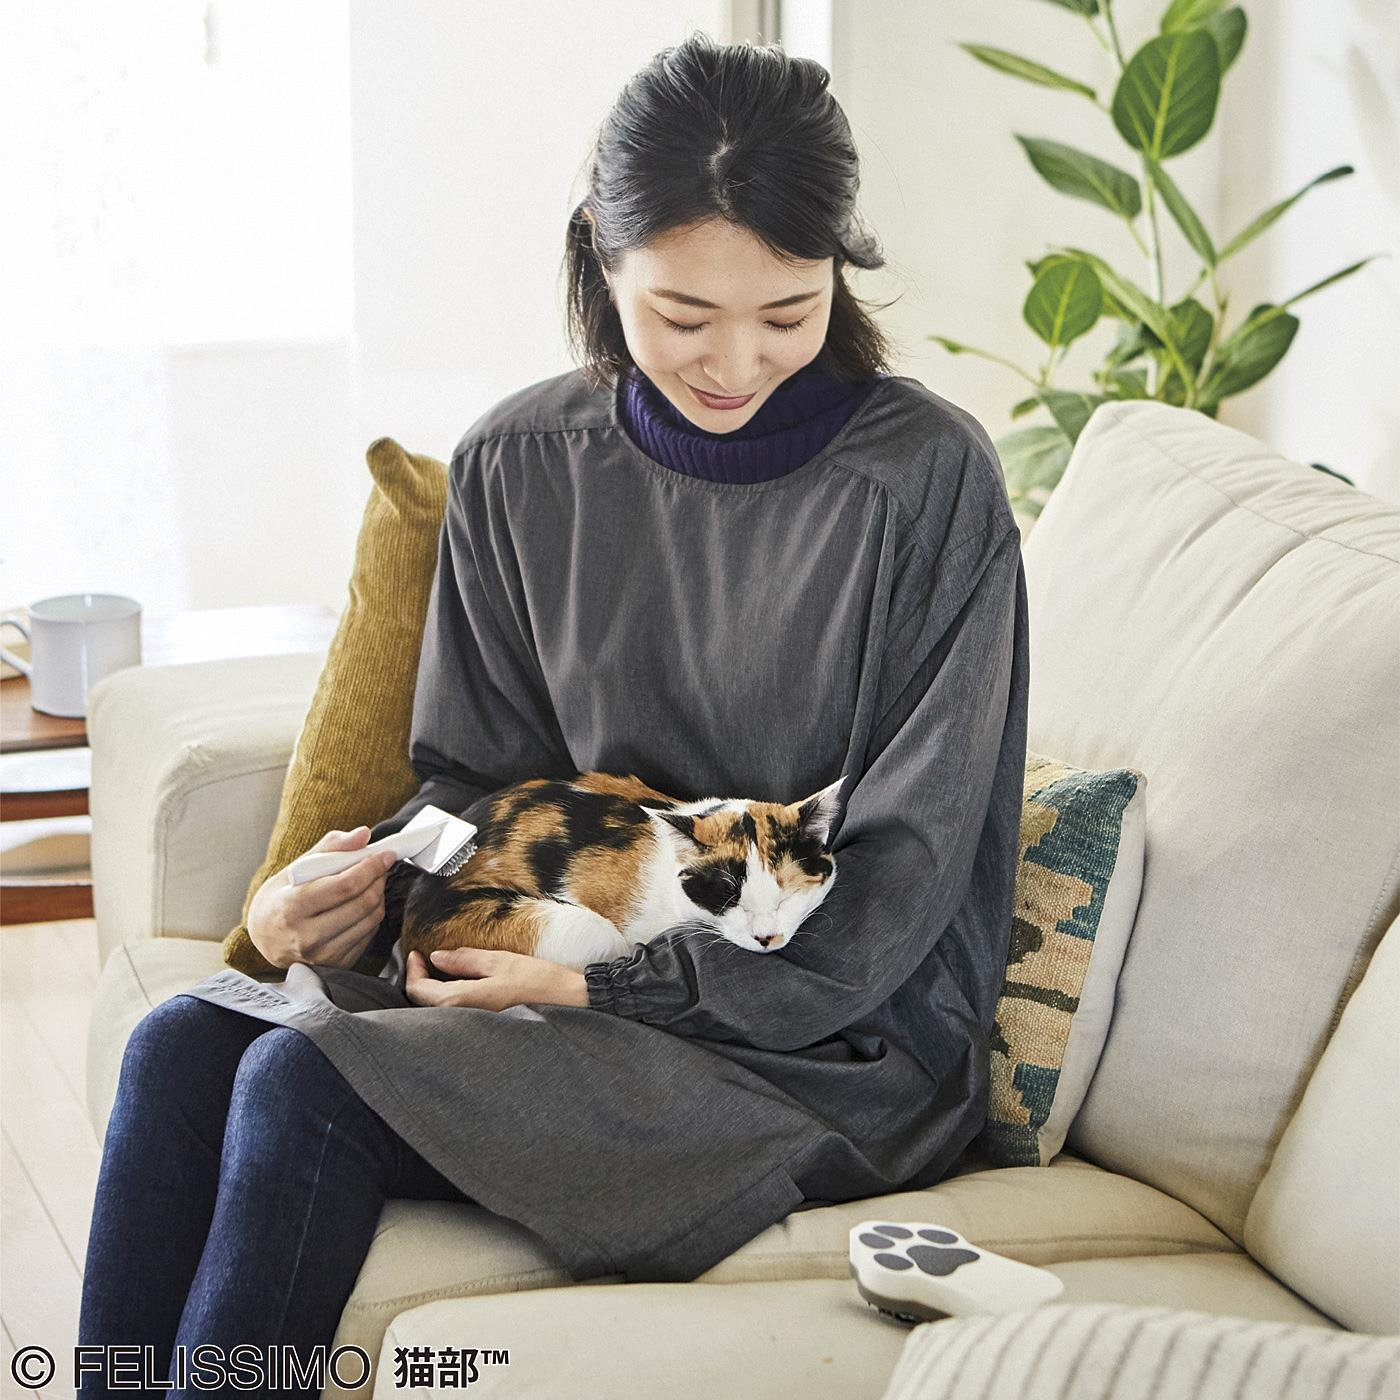 Grooming Labo 猫とじゃれあうときのお世話チュニック